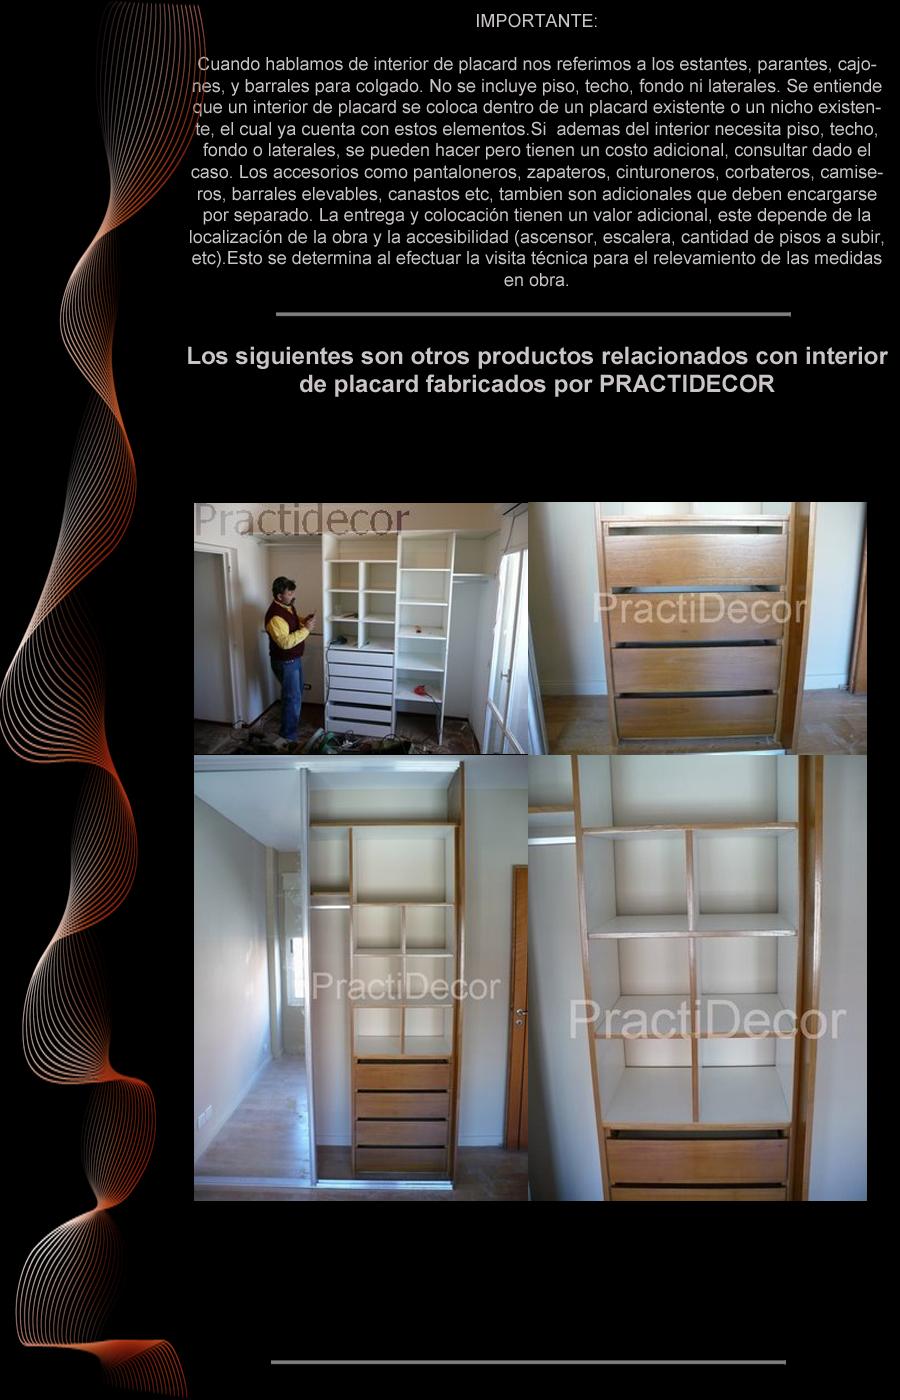 Interiores de placard 2m a vestidores frentes practidecor for Espejo de 1 metro por 2 metros